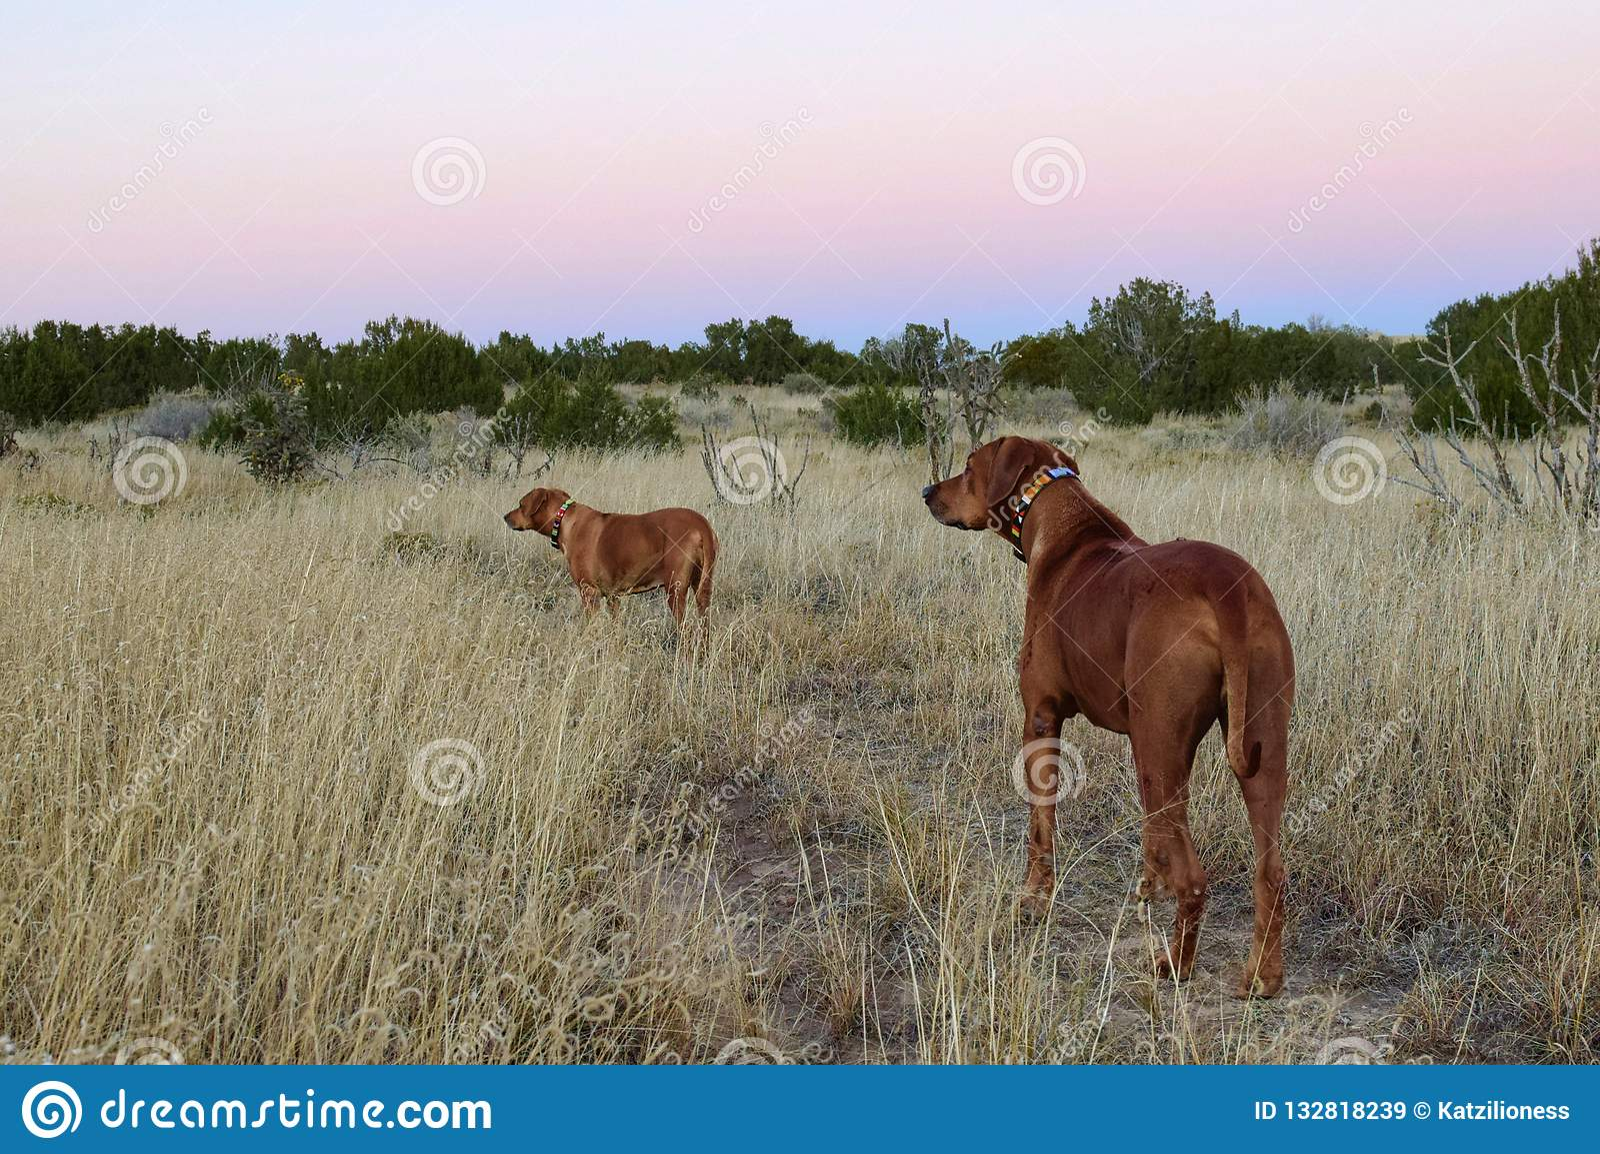 Two Rodisian Ridgebacks dogs in New Mexico high desert landscape